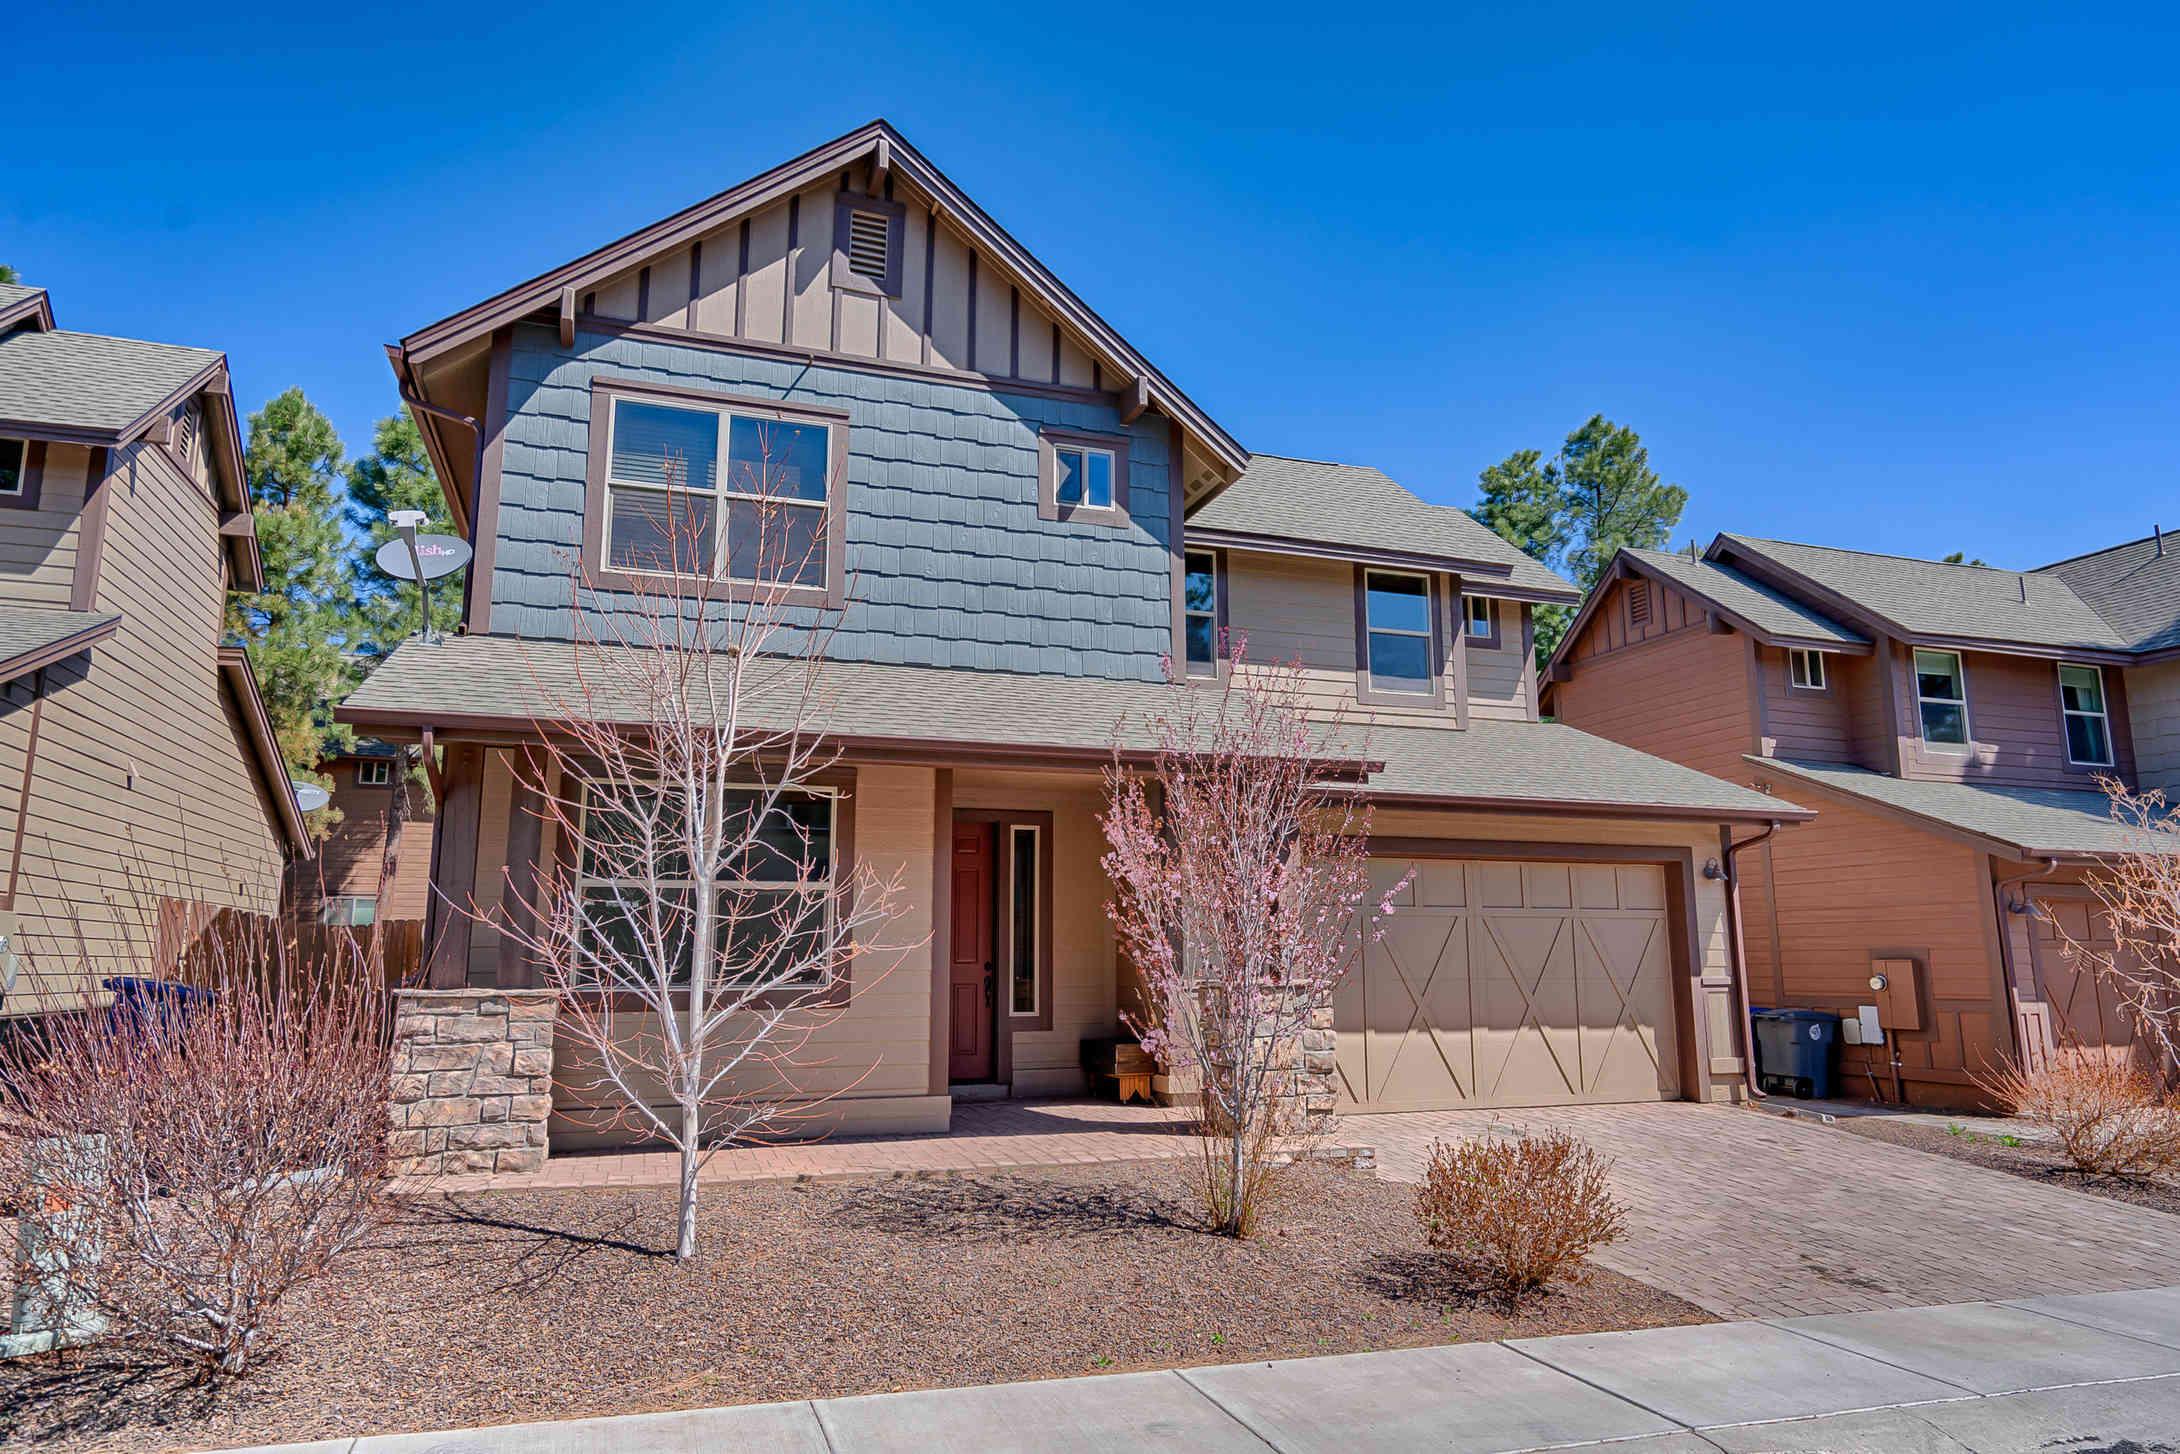 2745 W PICO DEL MONTE Circle, Flagstaff, AZ, 86001,